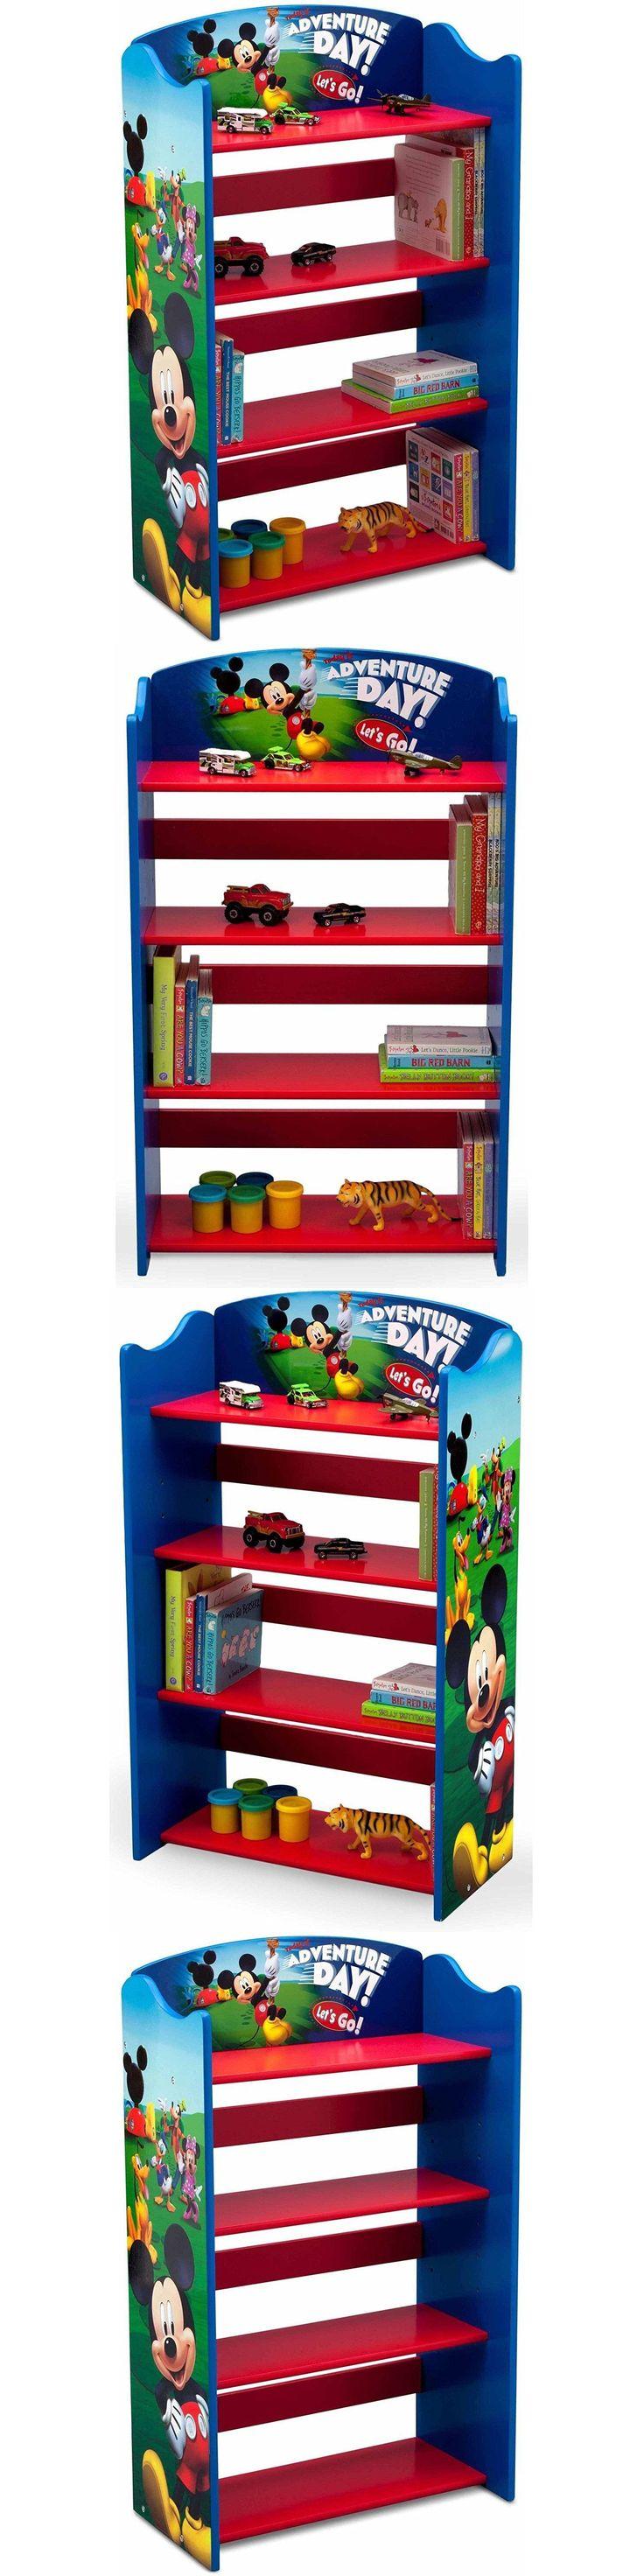 Mickey 19219: Disney Mickey Mouse Bookshelf 4-Tier Bookcase Book Organizer Kids Storage Unit -> BUY IT NOW ONLY: $33.99 on eBay!